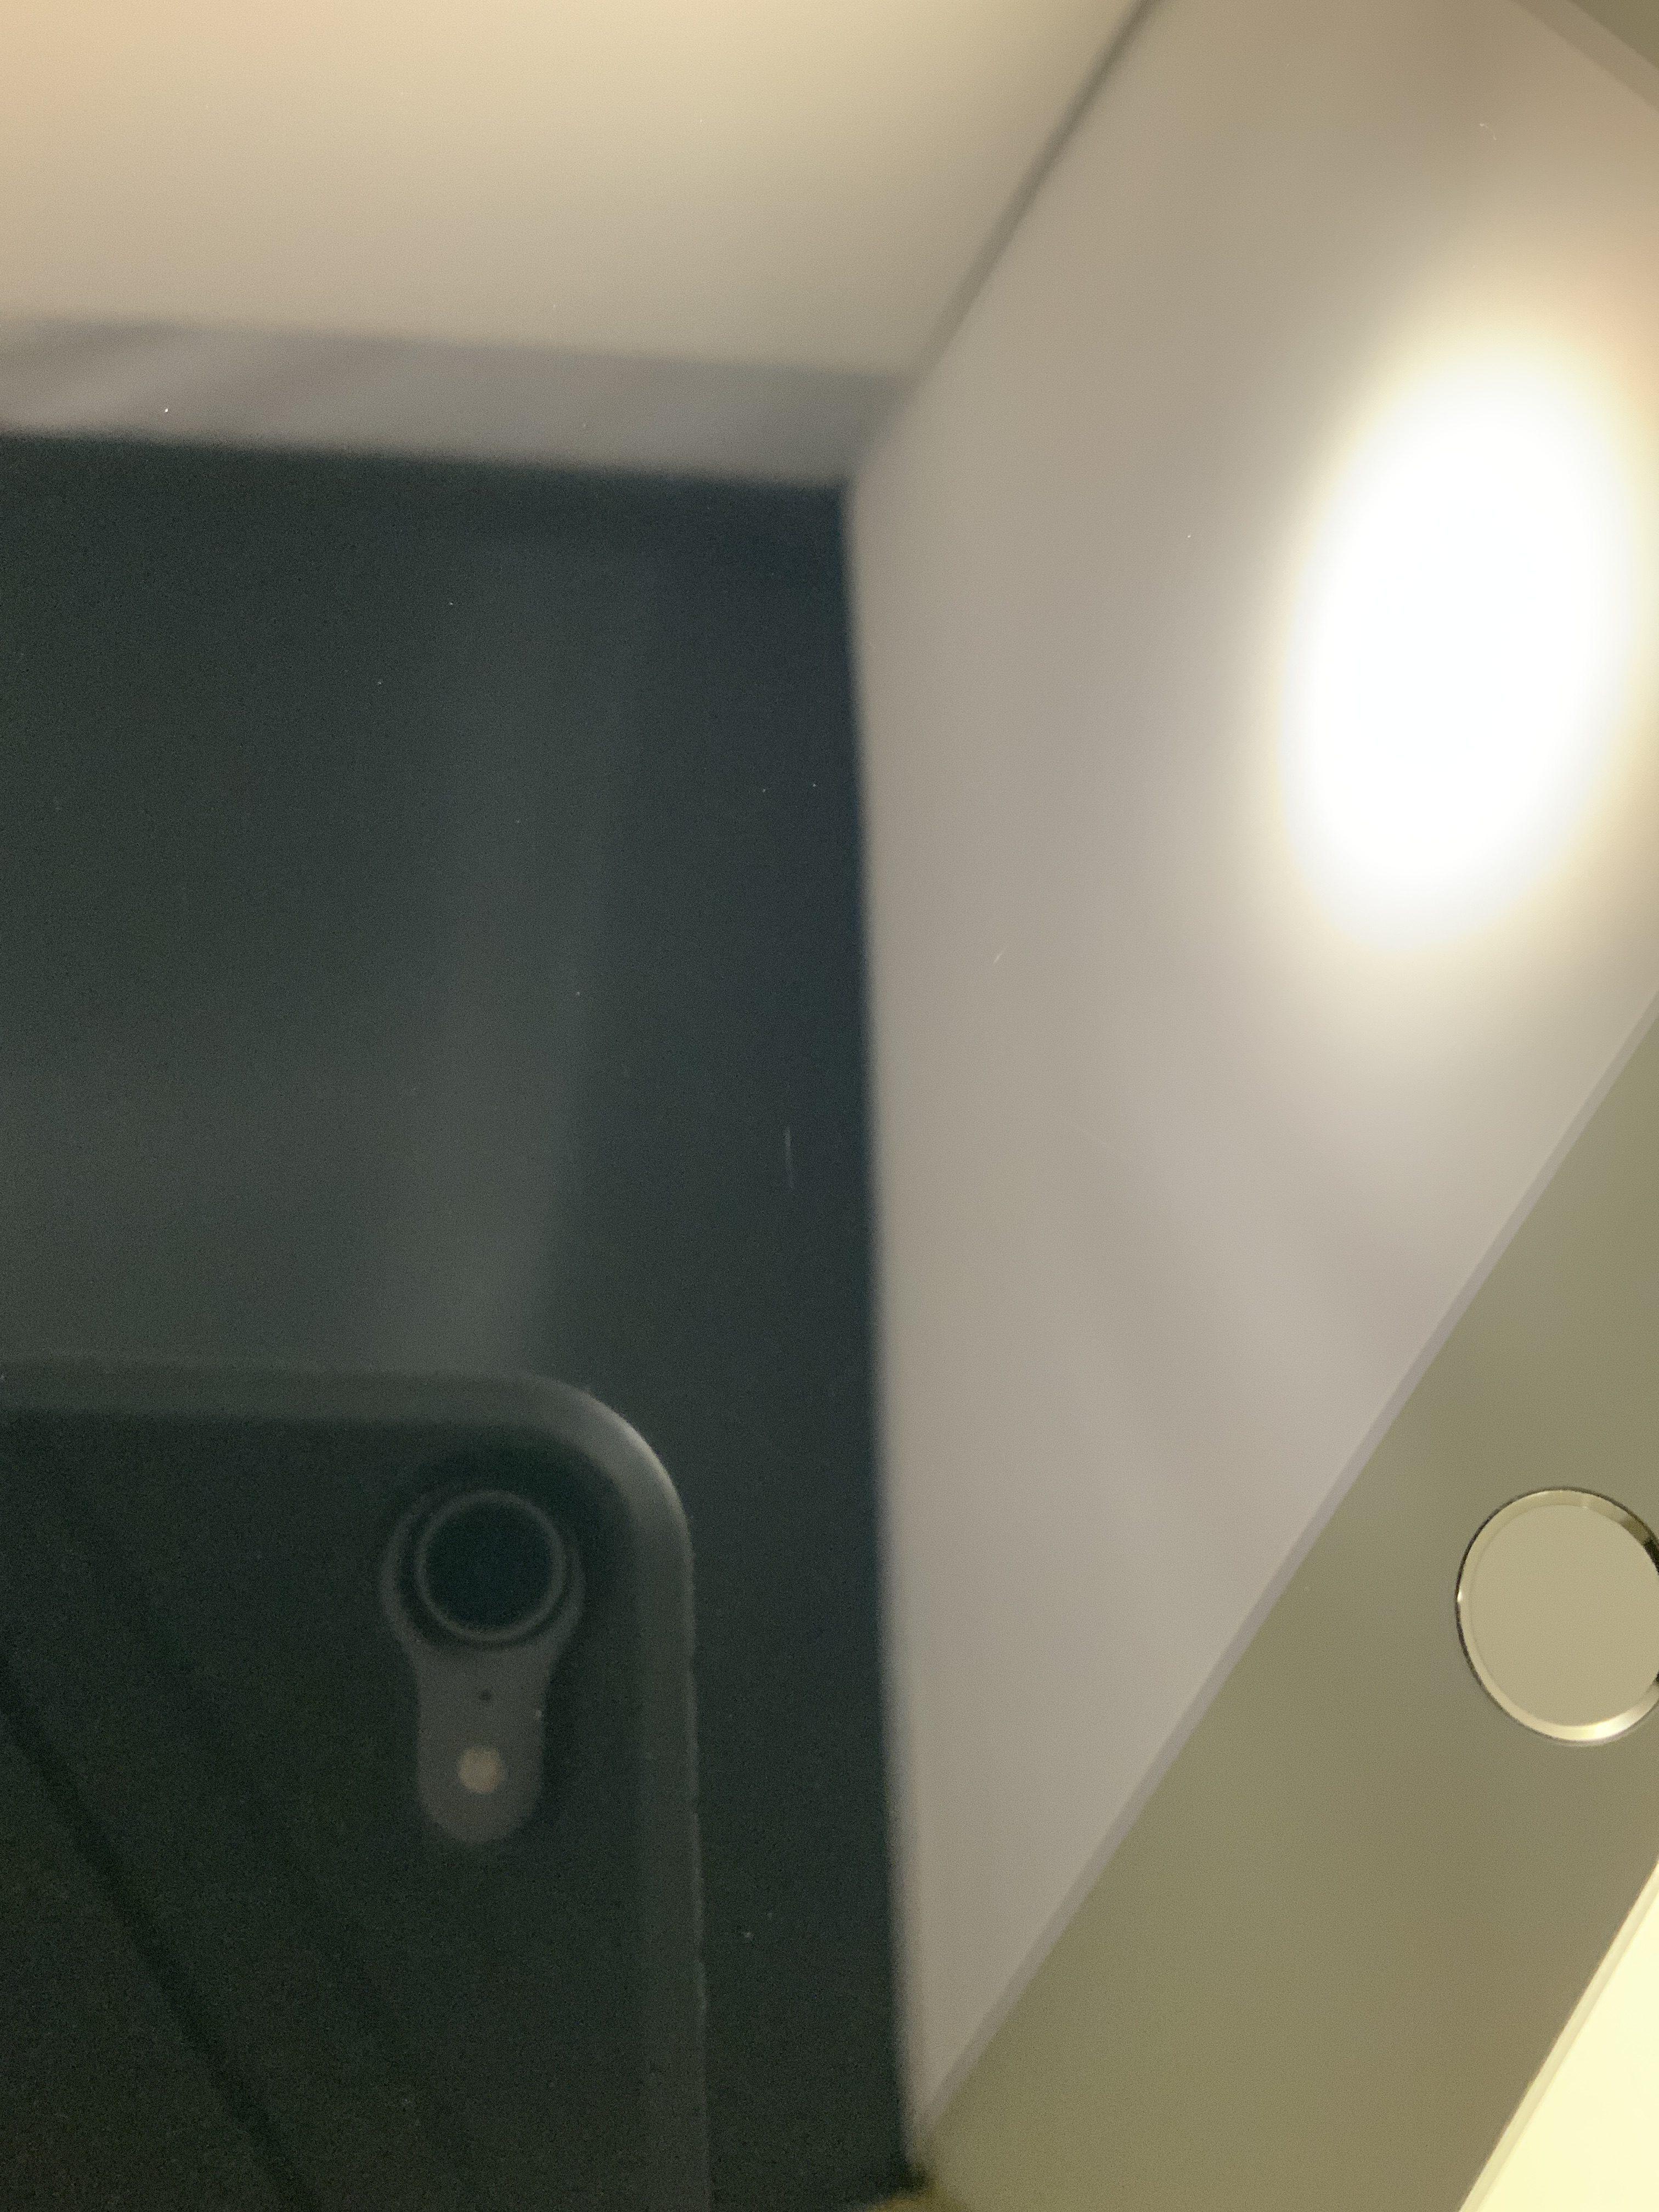 iPad 5 Wi-Fi + Cellular 128GB, 128GB, Space Gray, obraz 3